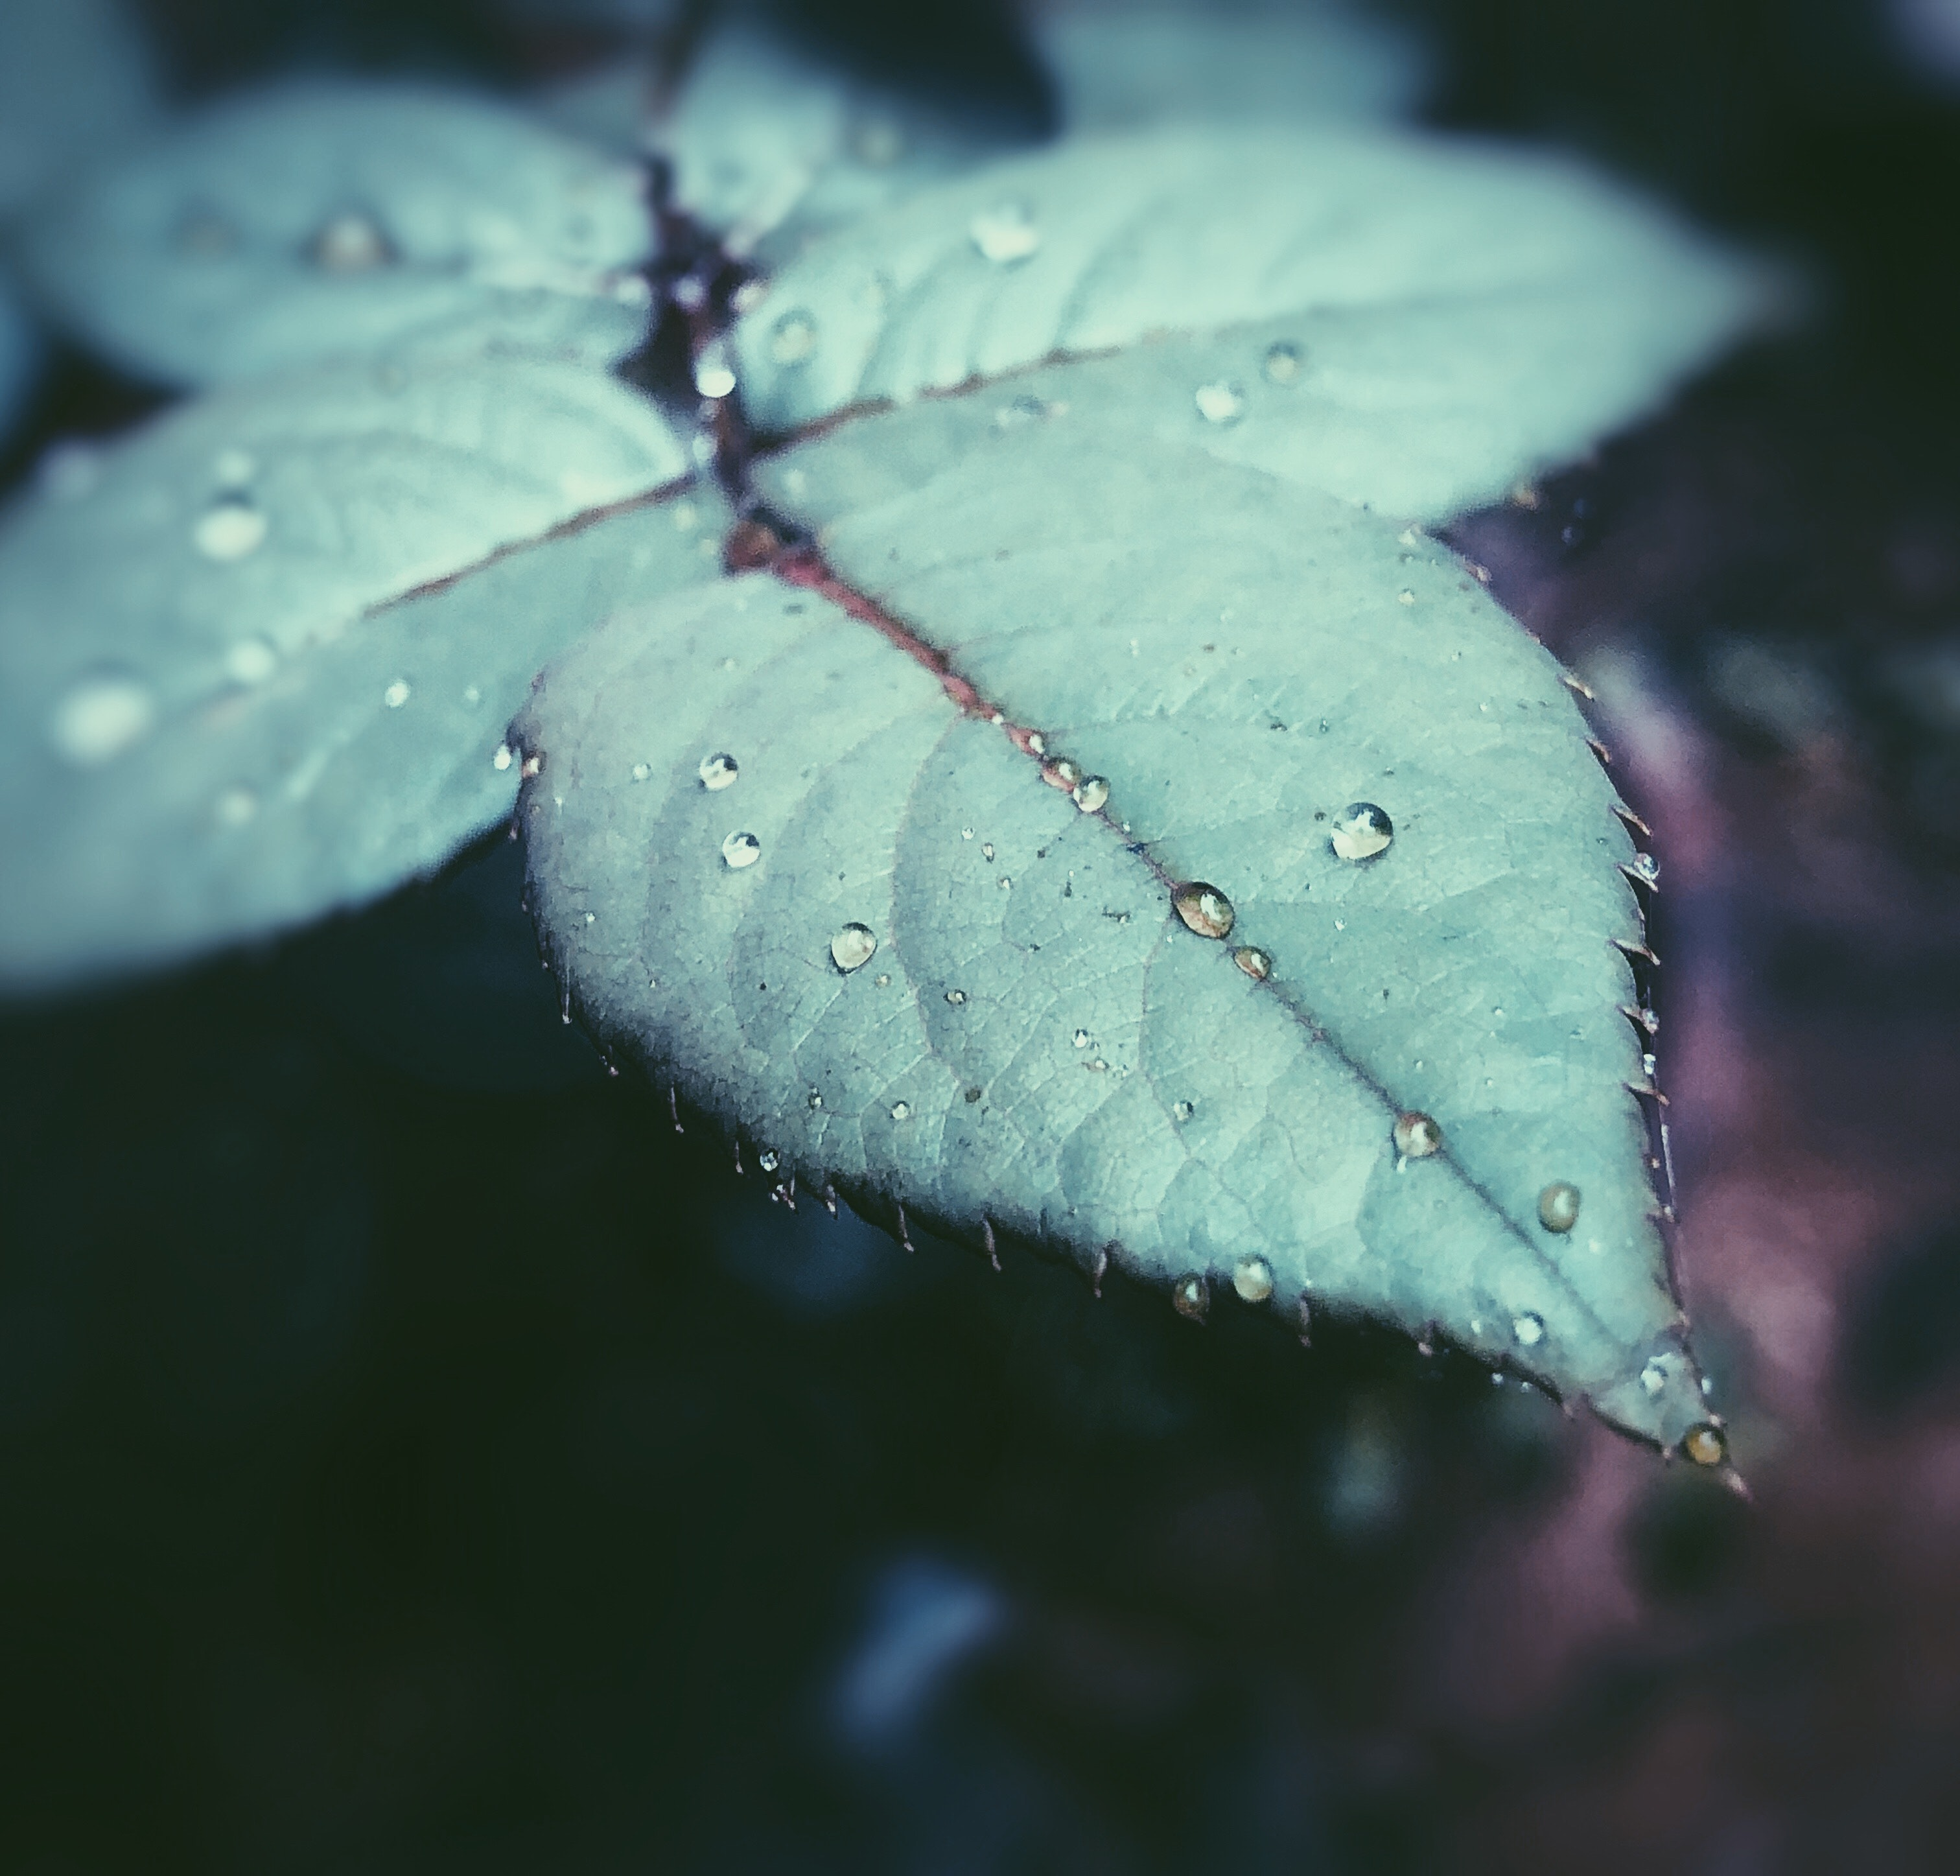 Lock Up Free Download Karan Aujla: Water Dews On Green Leaf Surface · Free Stock Photo